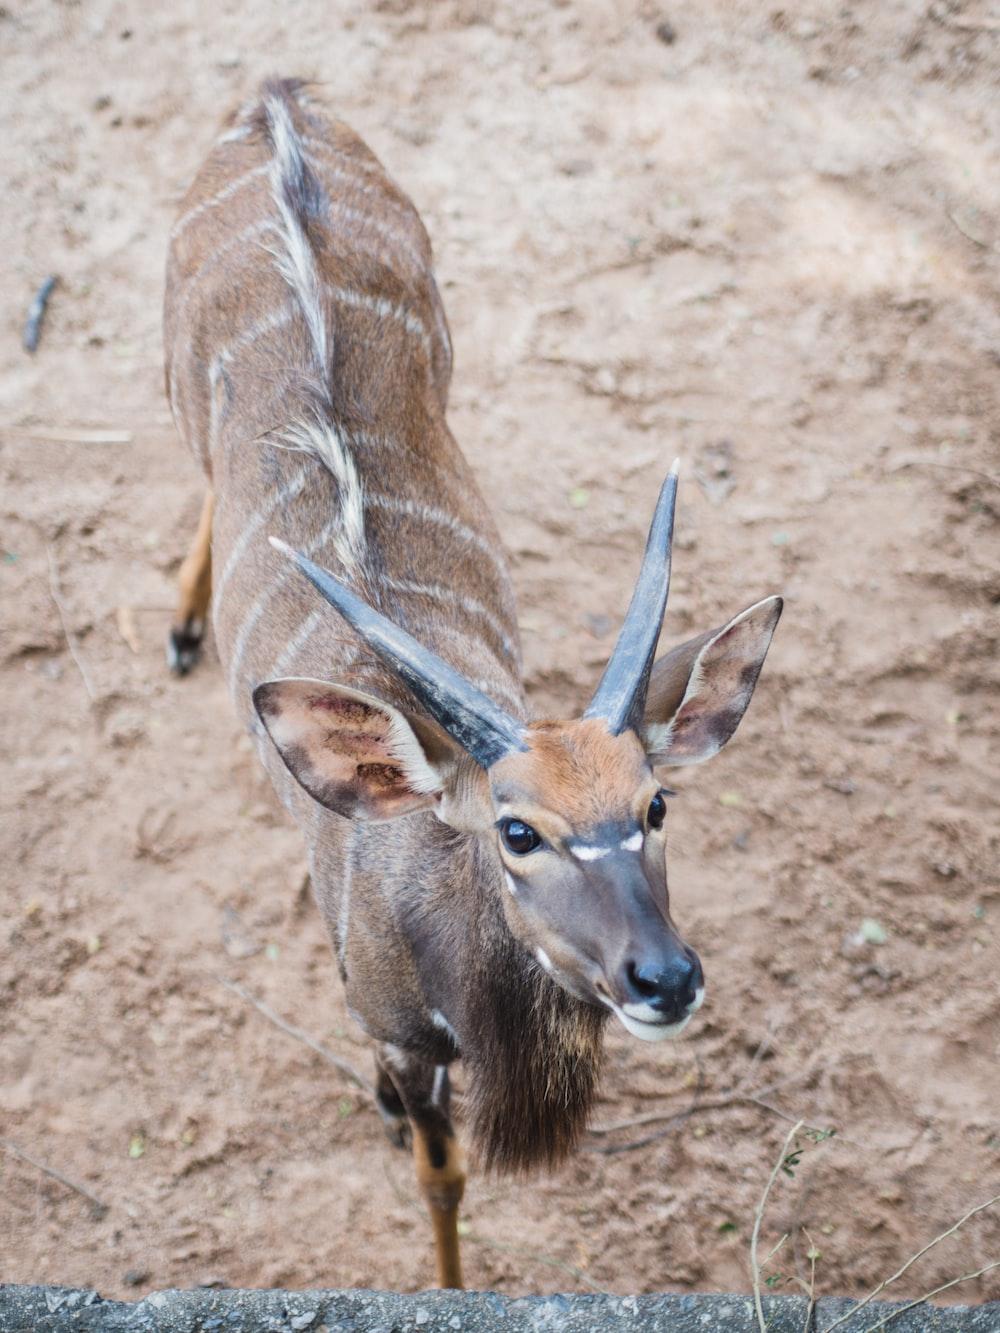 brown deer on brown soil during daytime